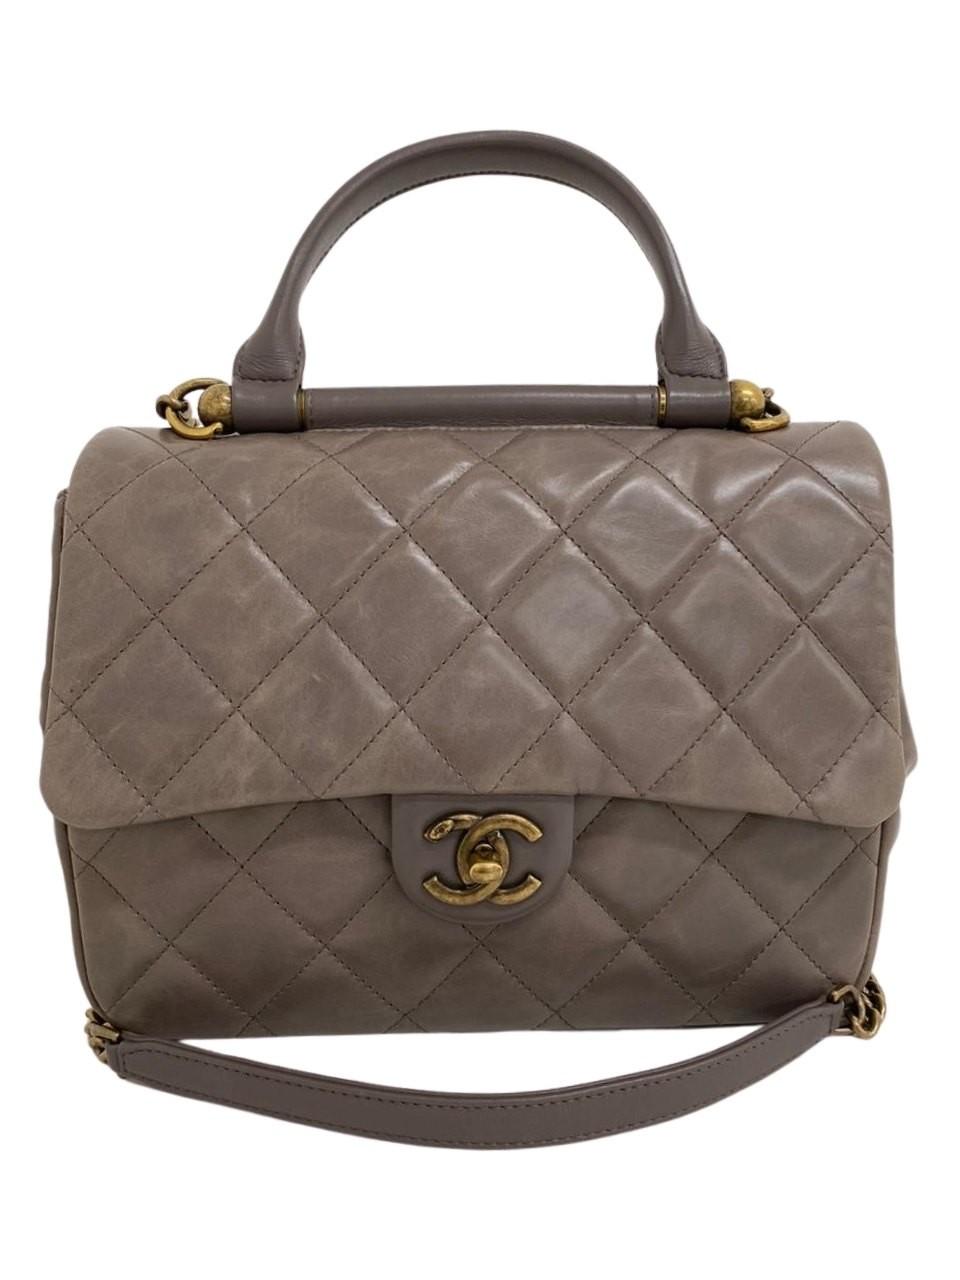 Bolsa Chanel Média Handle Lambskin